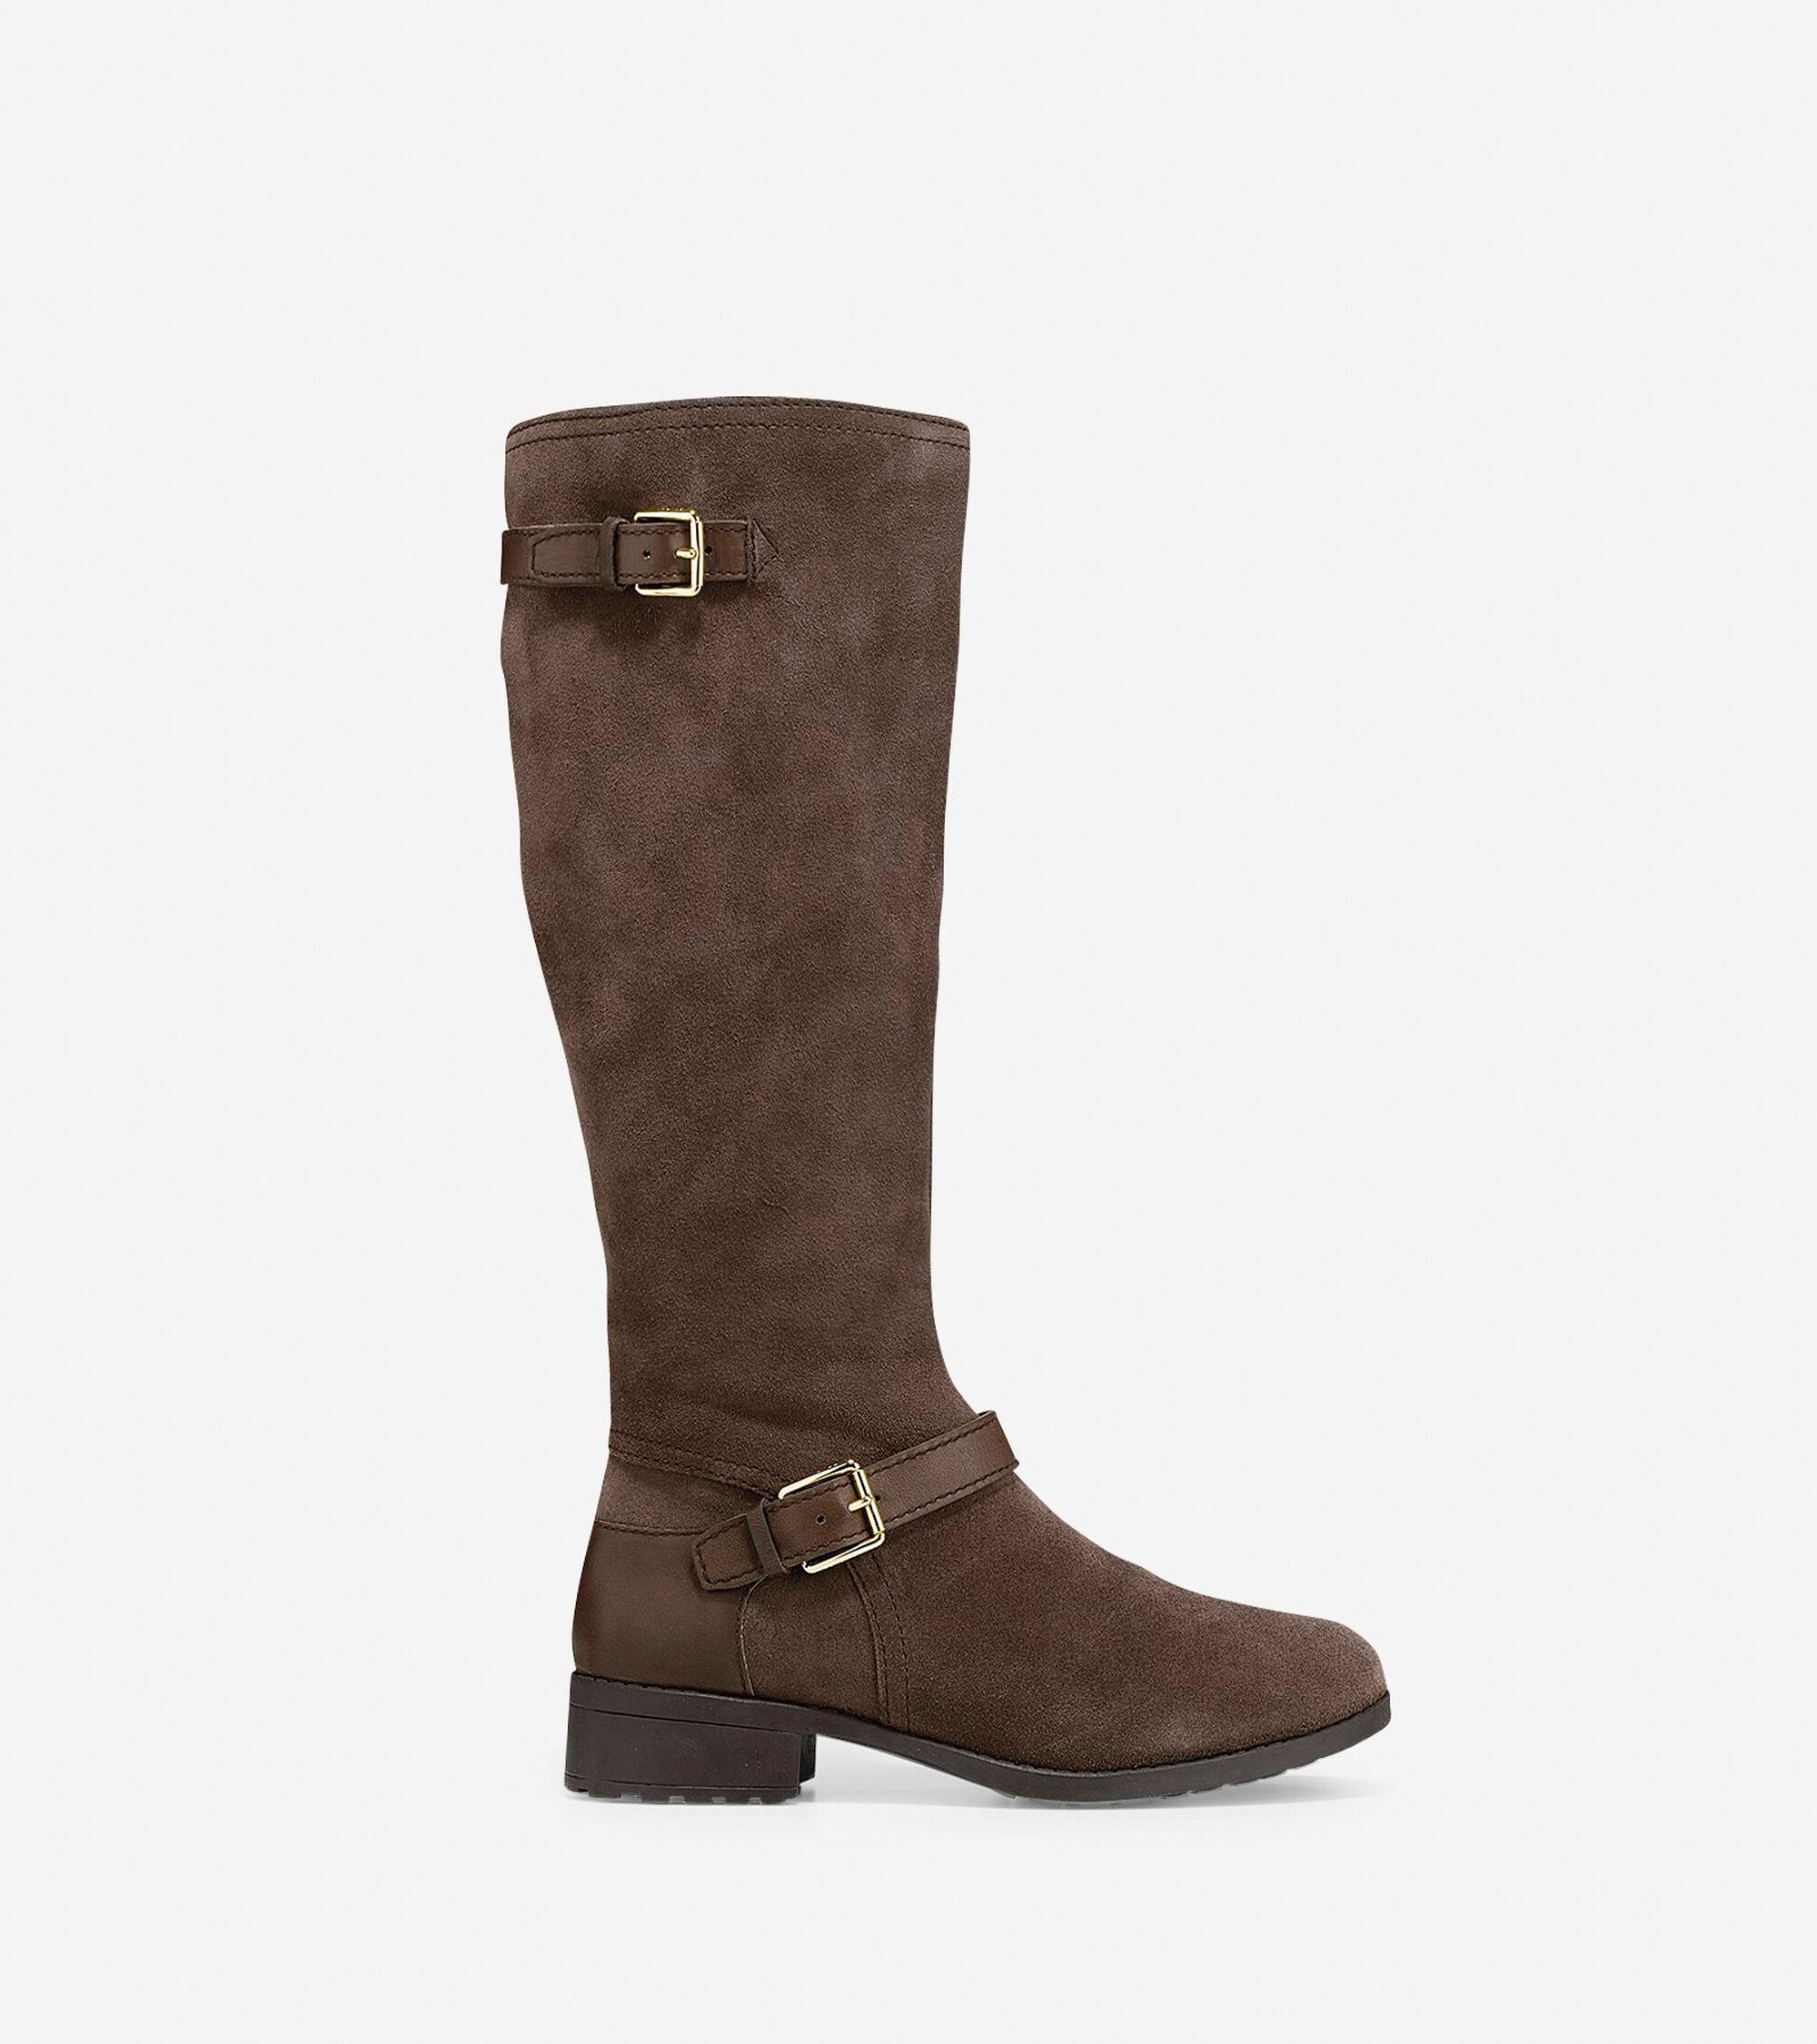 Cole Haan Womens Marla Waterproof Tall Boots